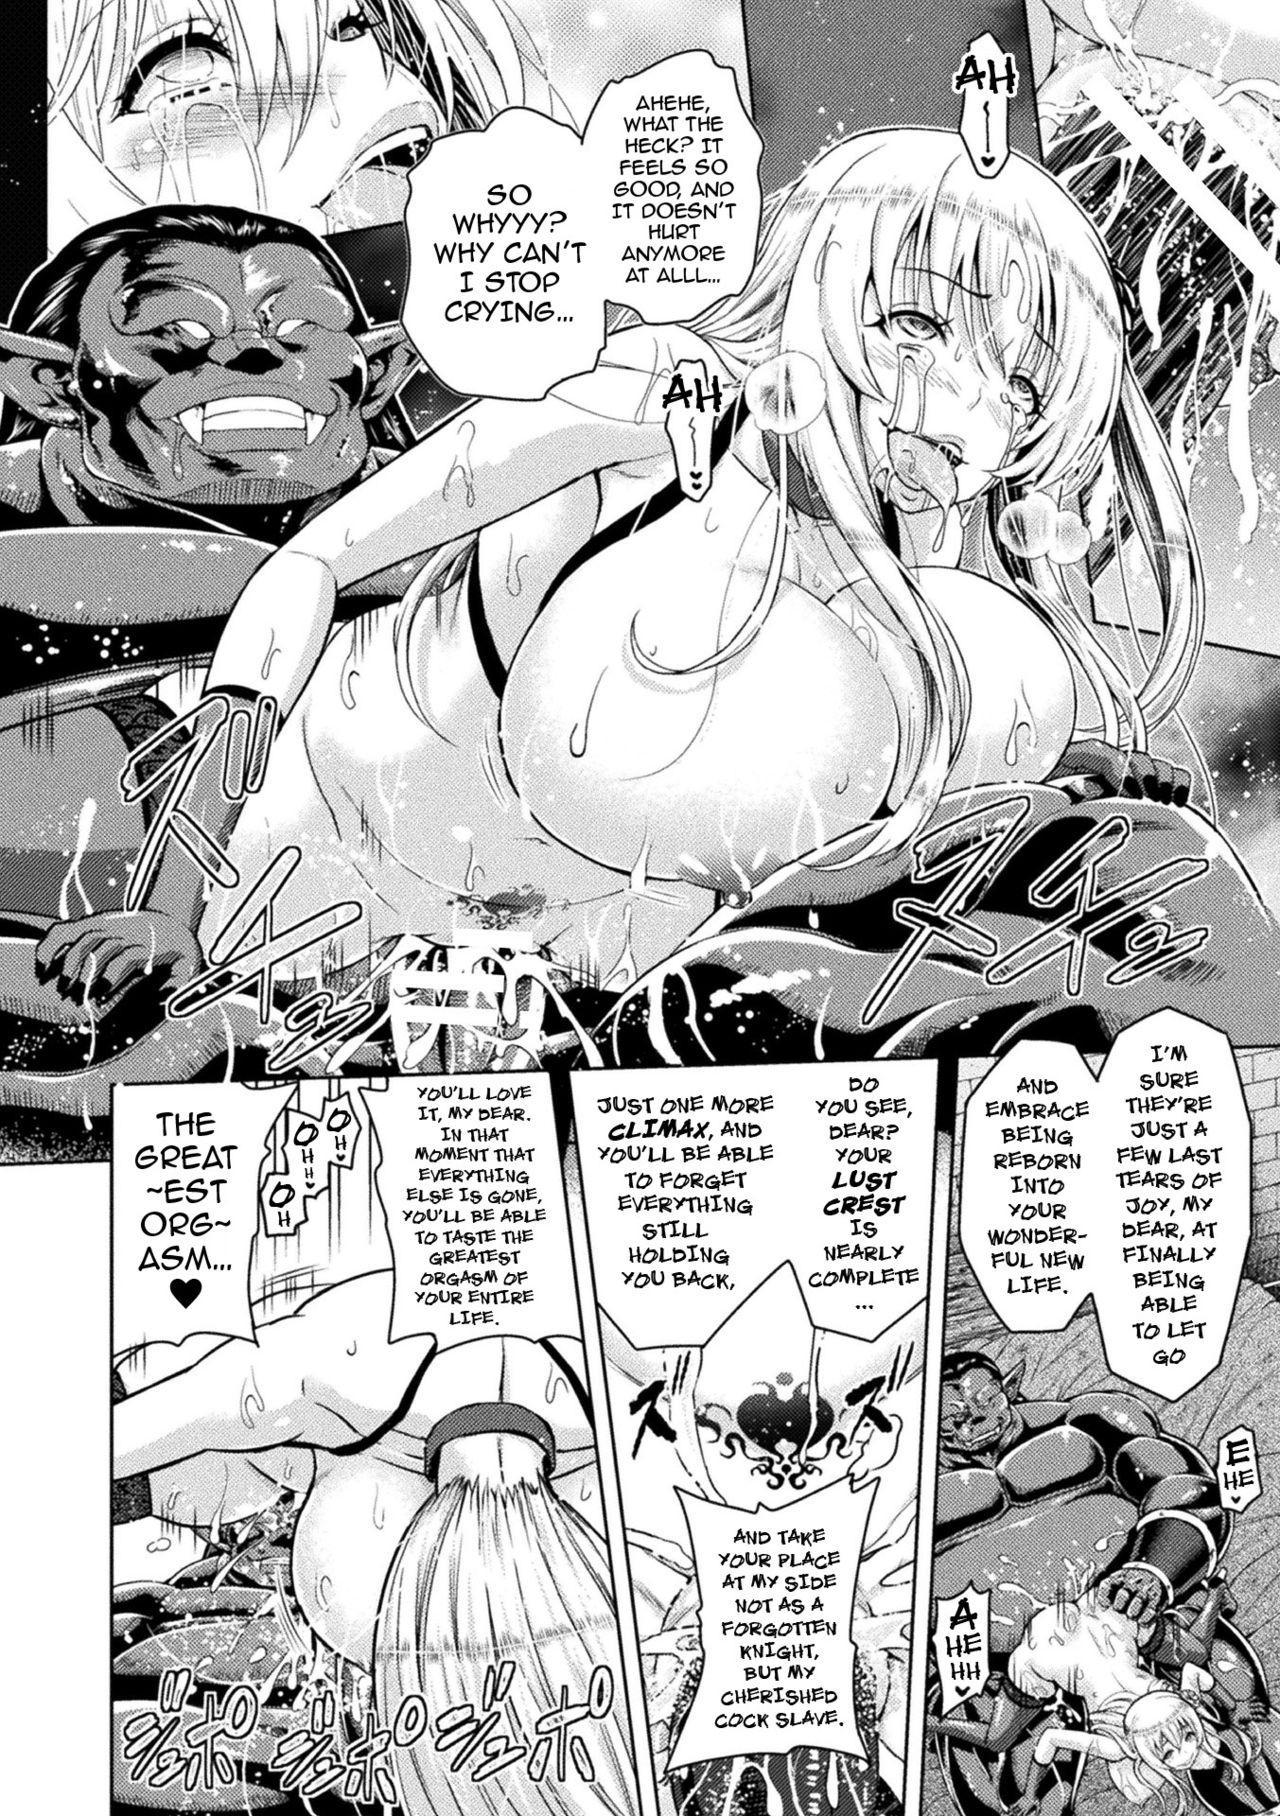 [Yamada Gogogo] Erona ~Orc no Inmon ni Okasareta Onna Kishi no Matsuro~ | Erona ~The Fall of a Beautiful Knight Cursed with the Lewd Mark of an Orc~ [English] {darknight} 70